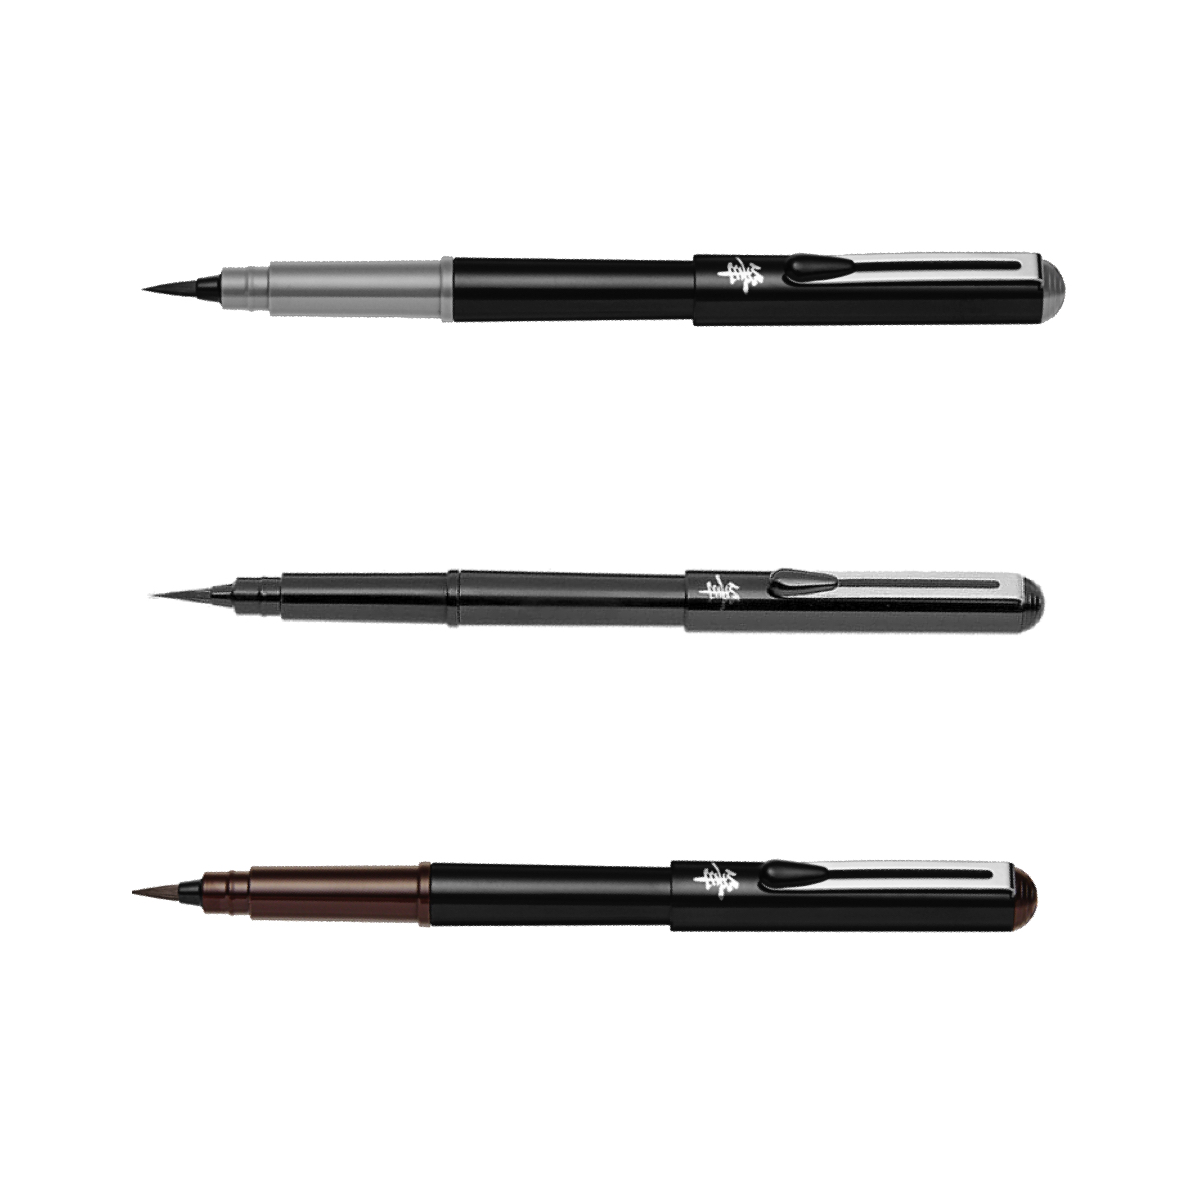 Pentel - Pinselstift Pocket Brush 3er Set